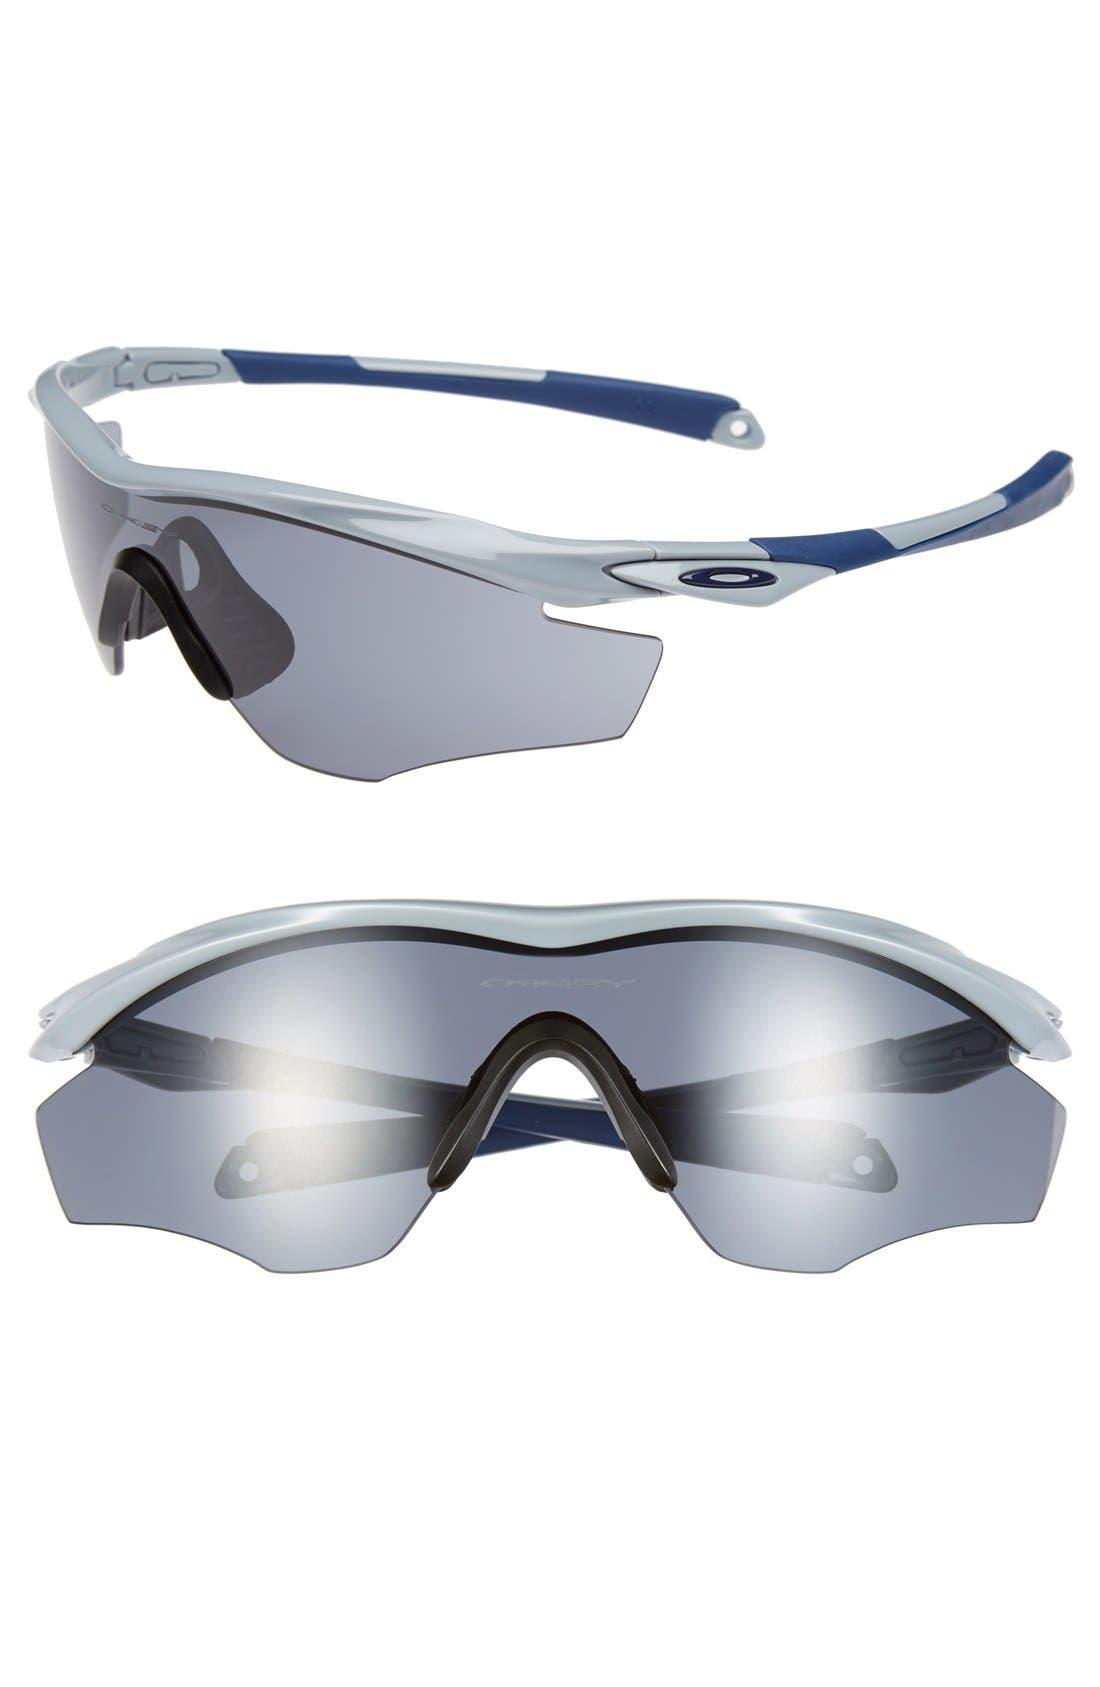 Alternate Image 1 Selected - Oakley 'M2 Frame' 175mm Shield Sunglasses